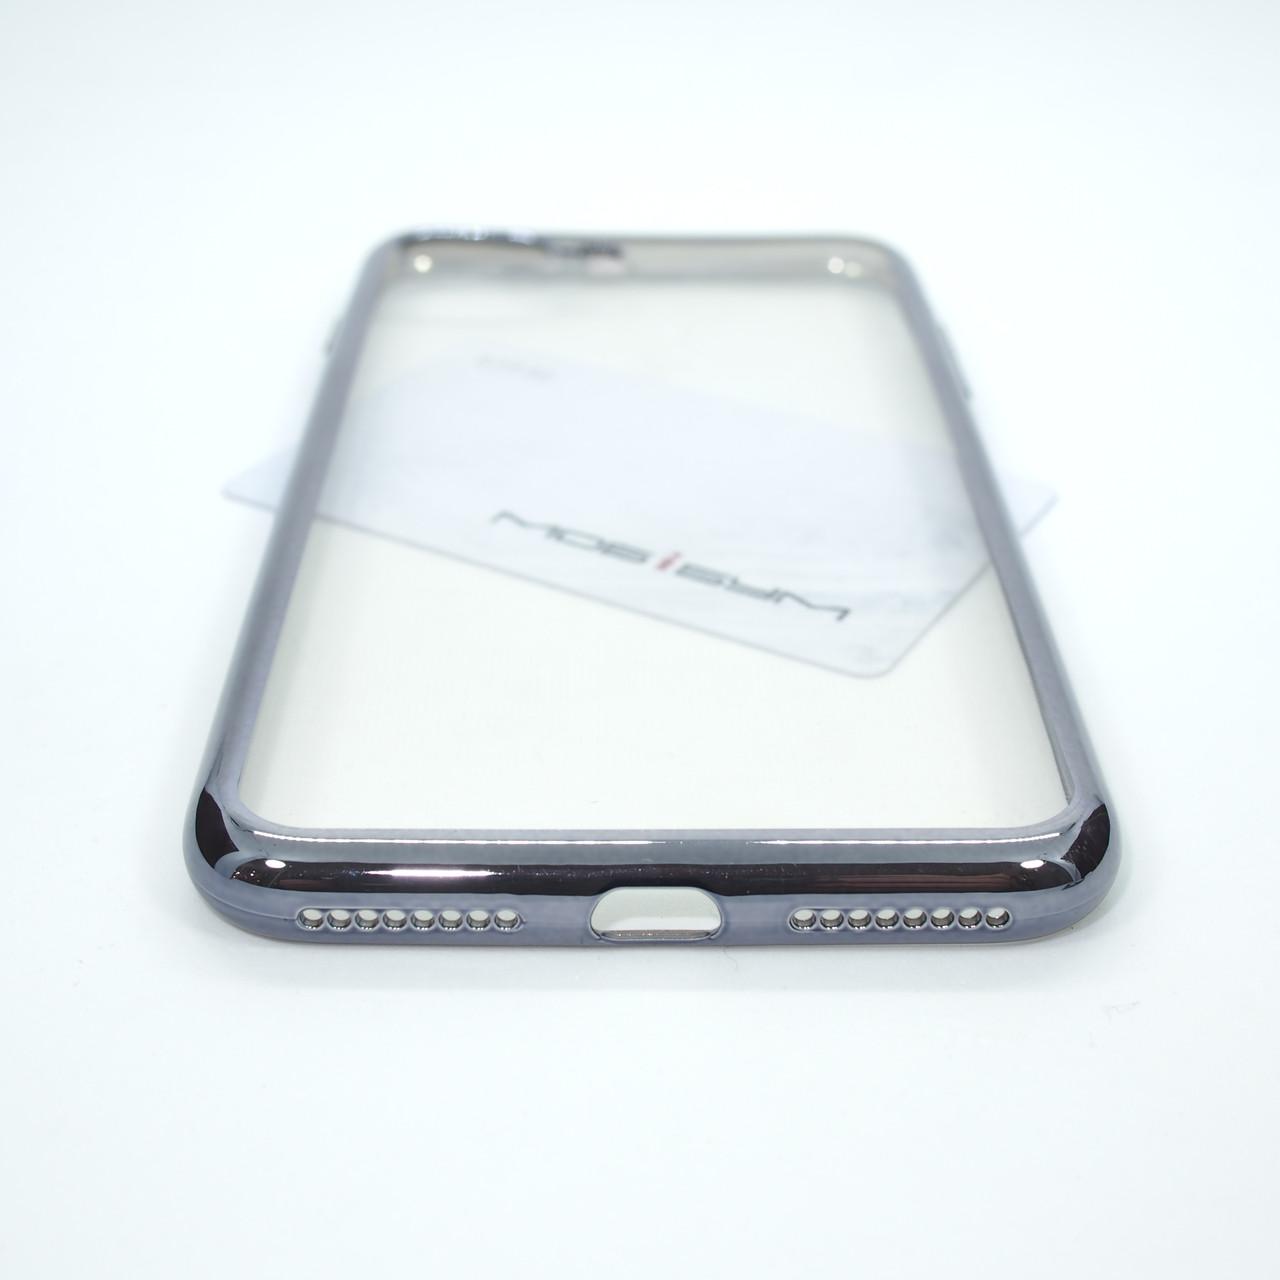 TPU bamper iPhone 8 Plus 7 grey Для телефона Apple